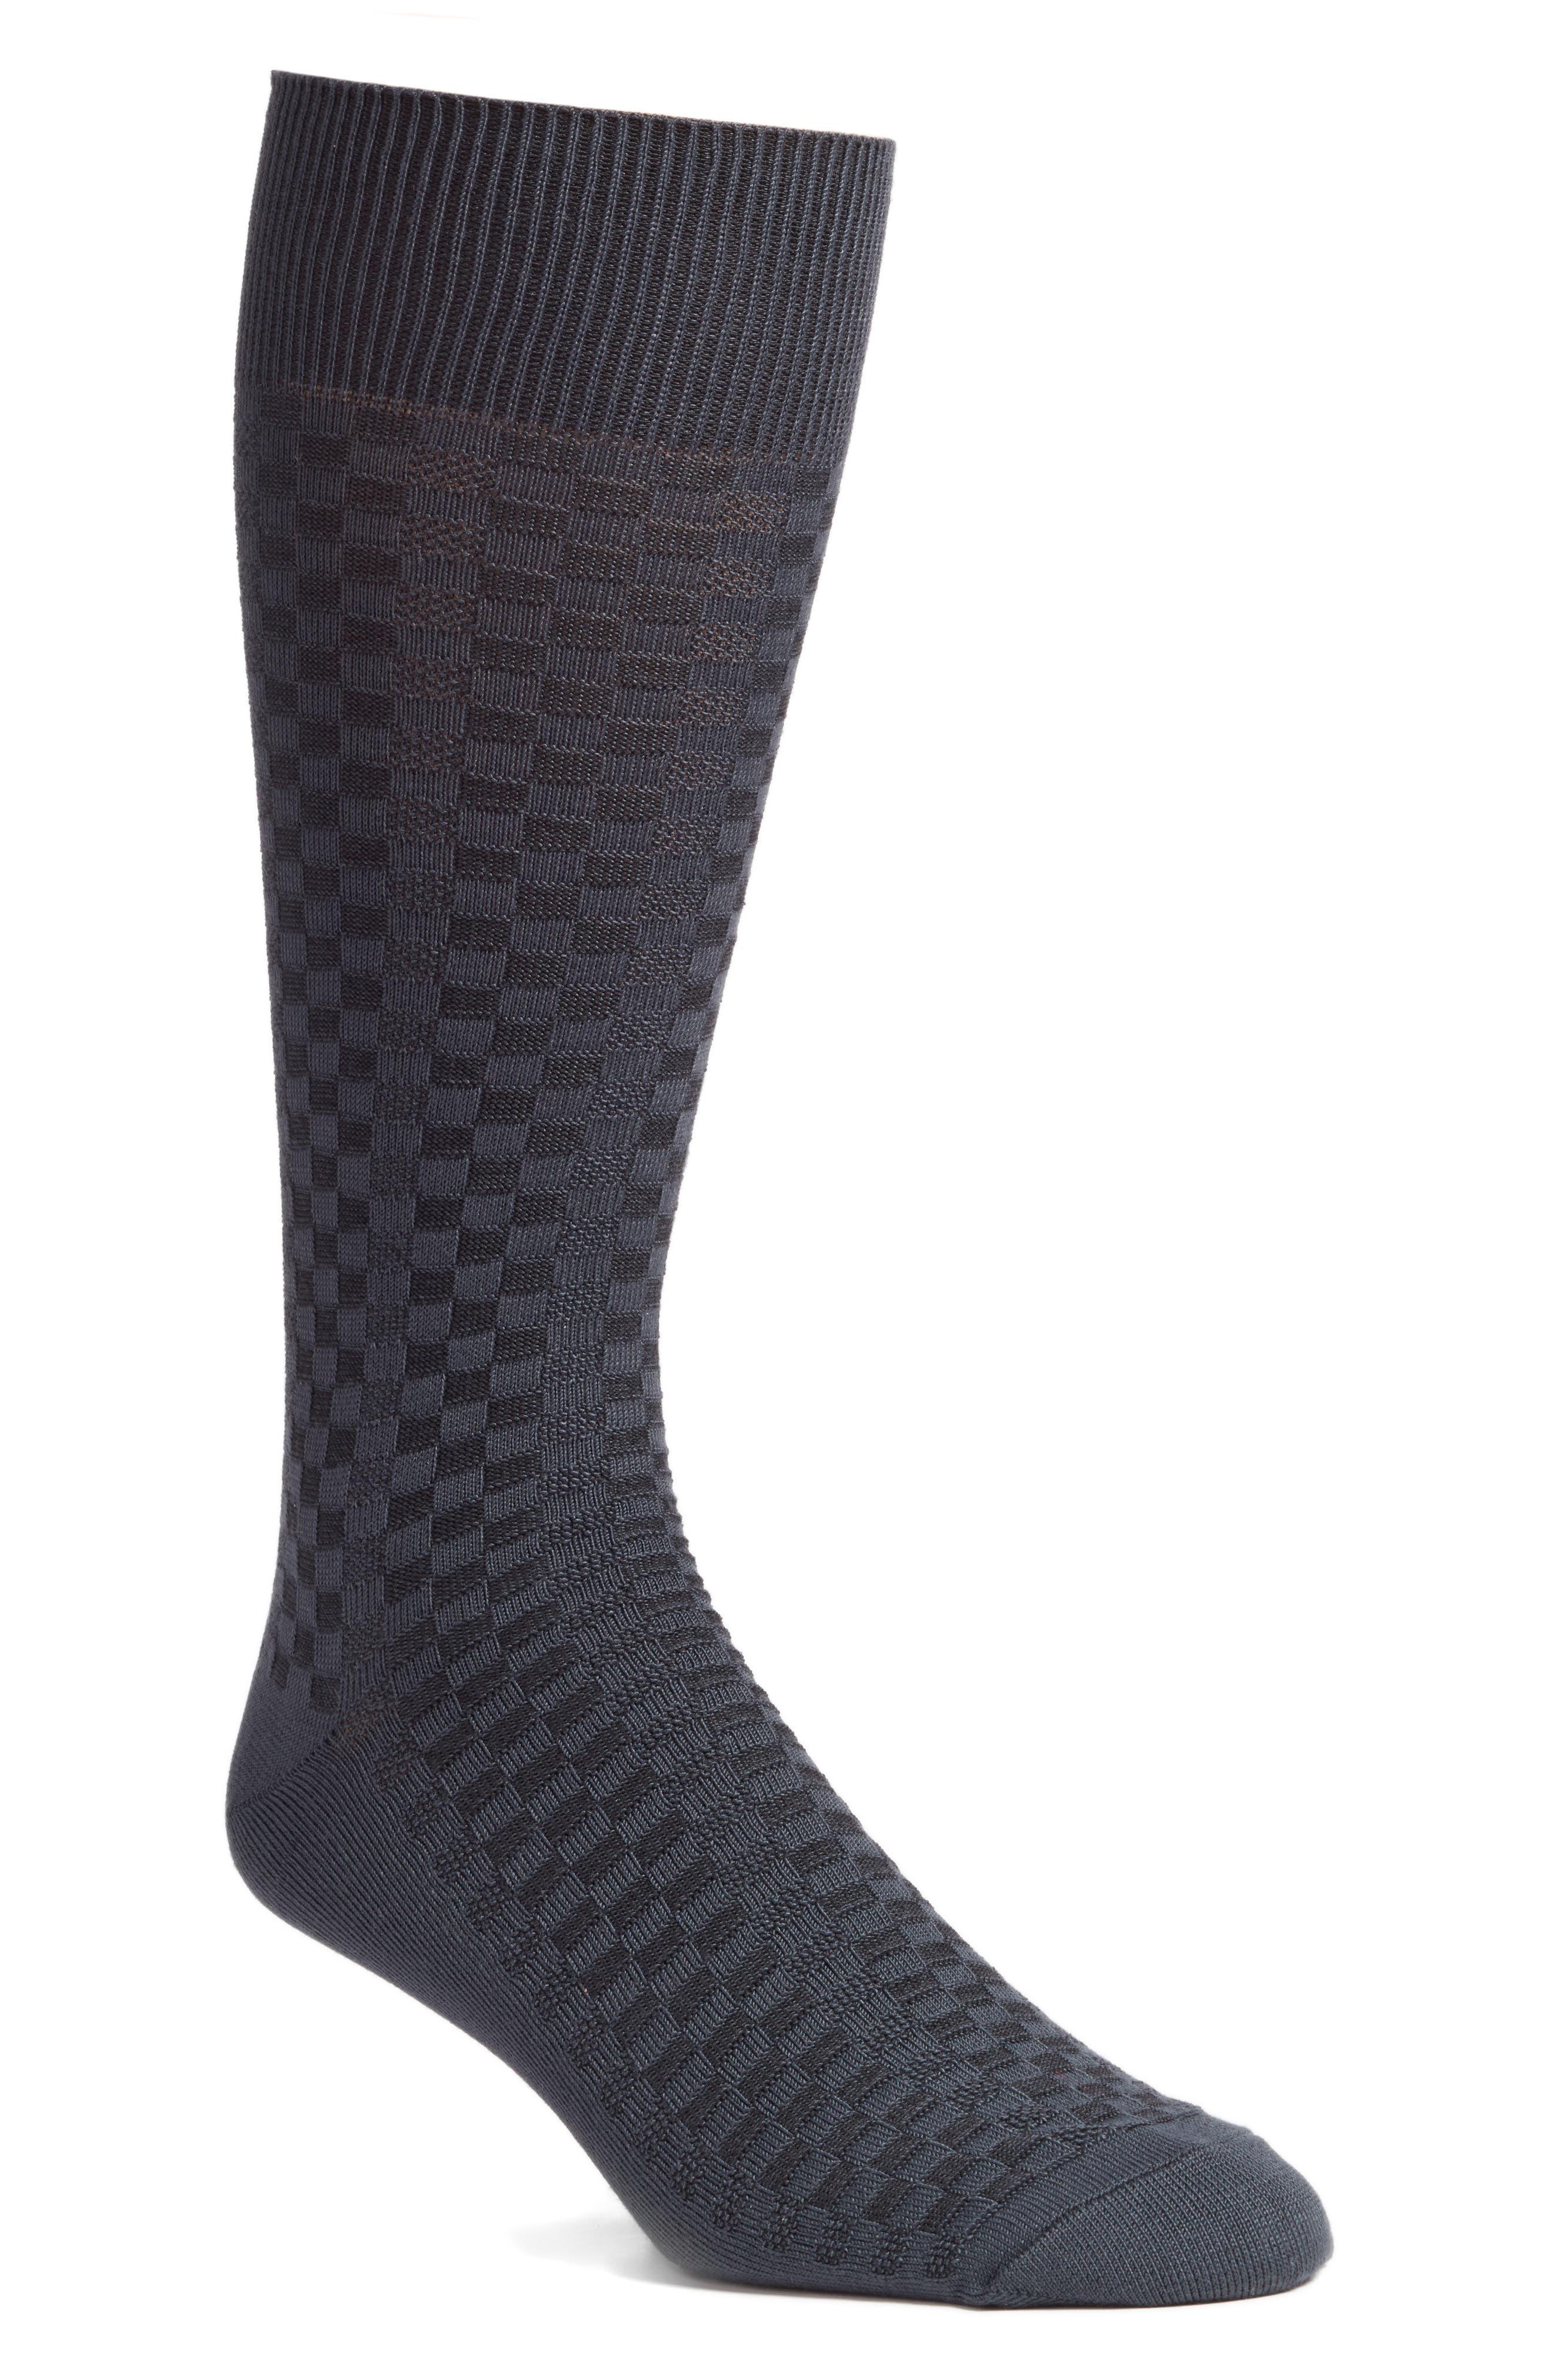 NORDSTROM MEN'S SHOP, Mini Check Ultrasoft Socks, Main thumbnail 1, color, CHARCOAL MARL